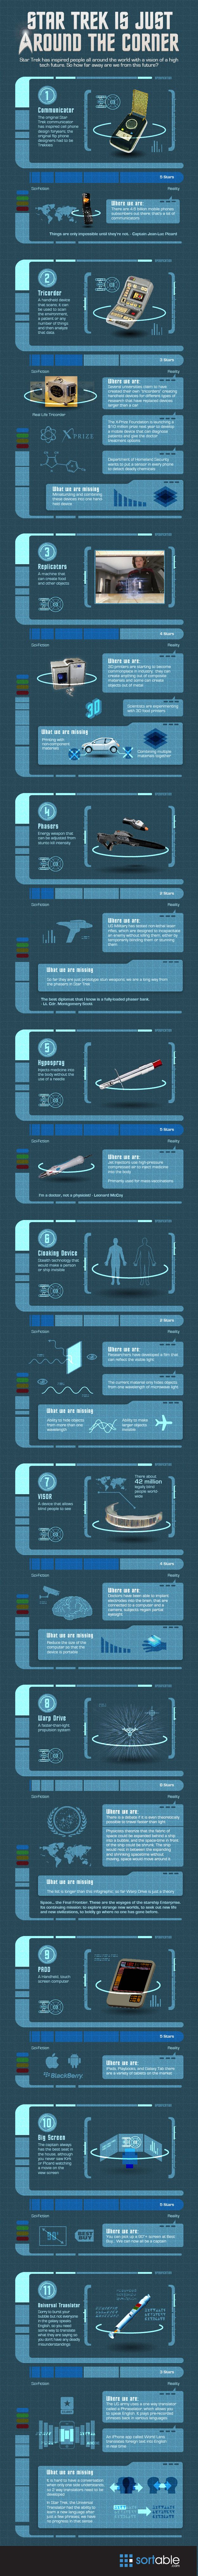 Star Trek Technology: talvolta la realtà supera la fantasia… Certo mancano an…